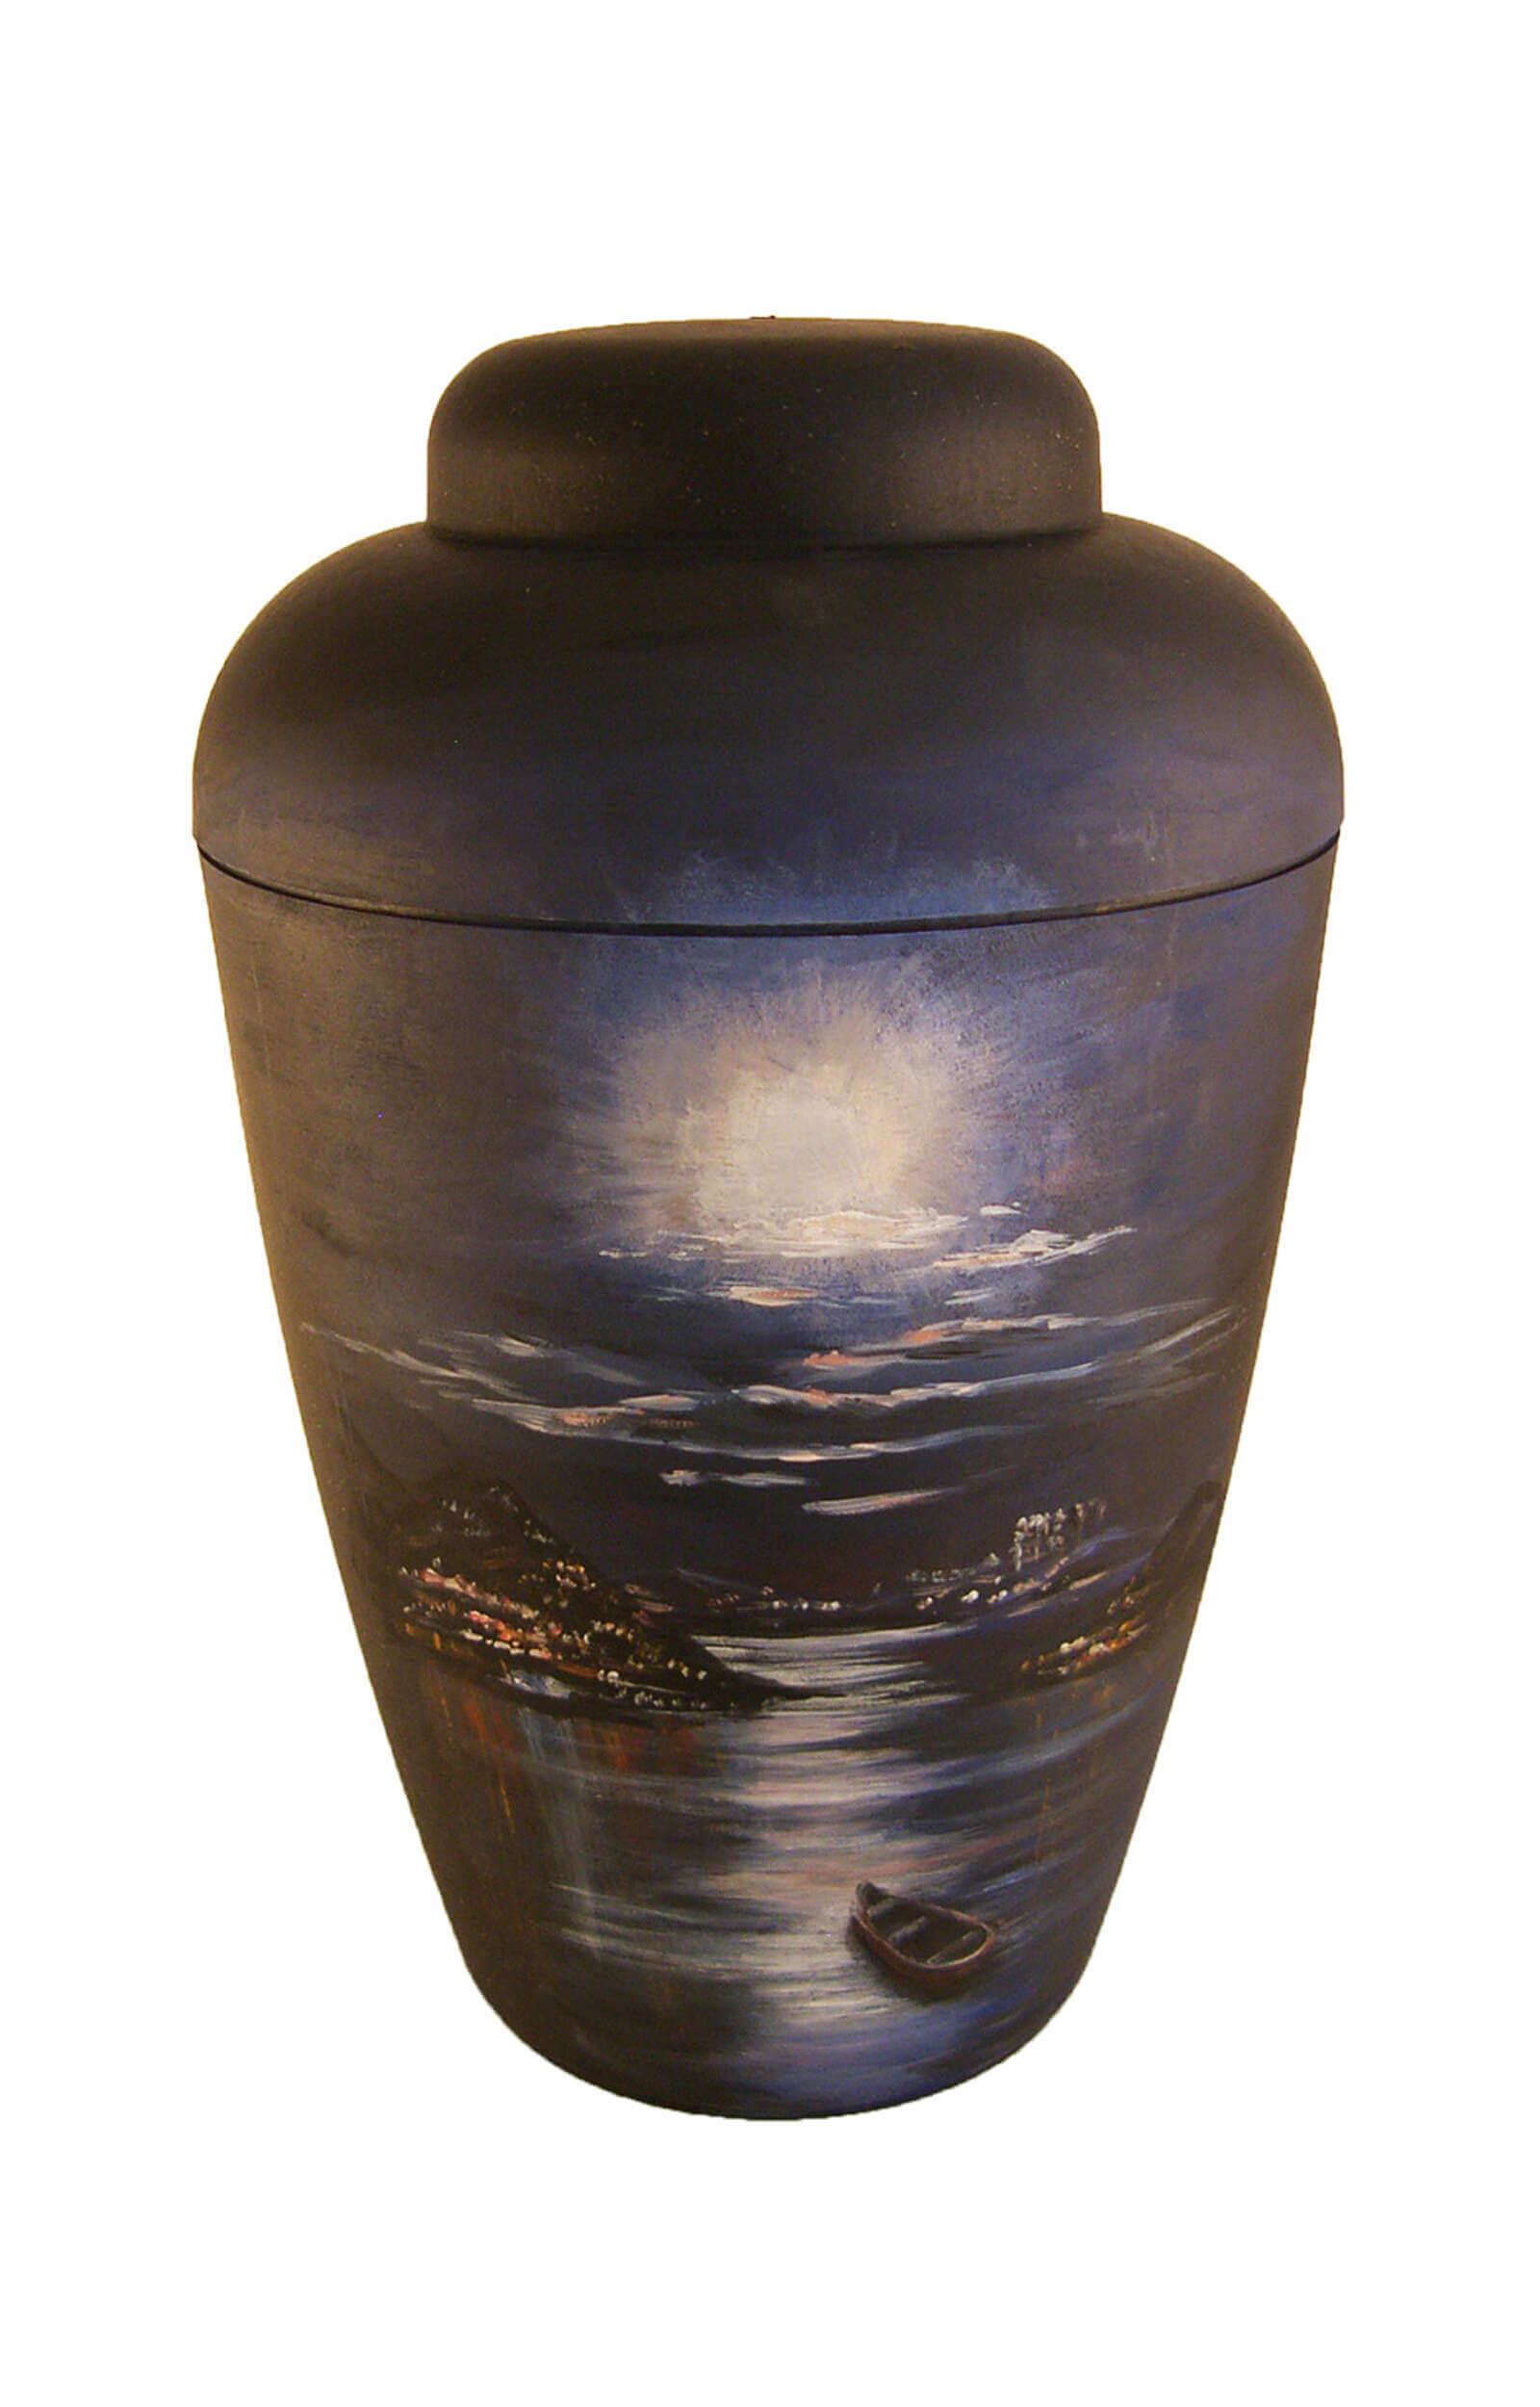 en BS1404 funeral urns on sale black hand painted artist urn city at night